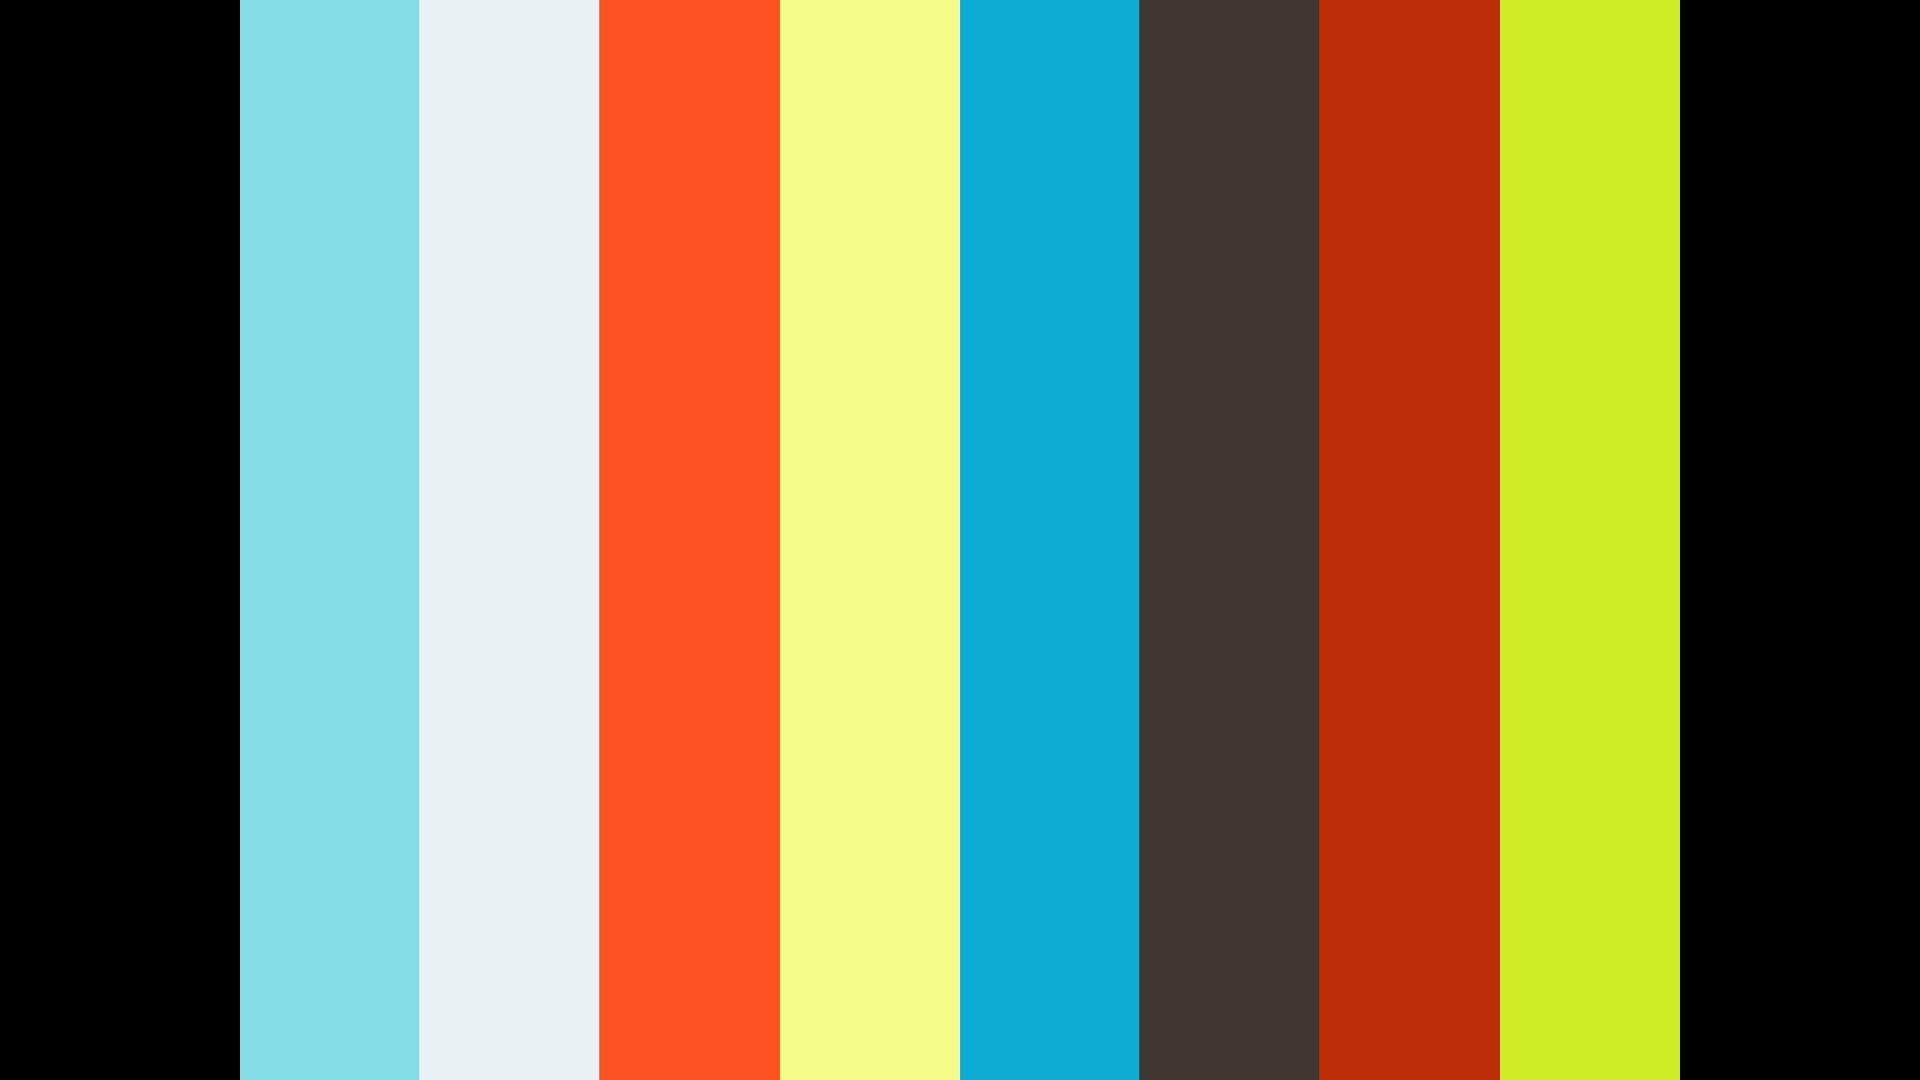 JOHN - Incarnation - Andrew Cameron - 9.02.20